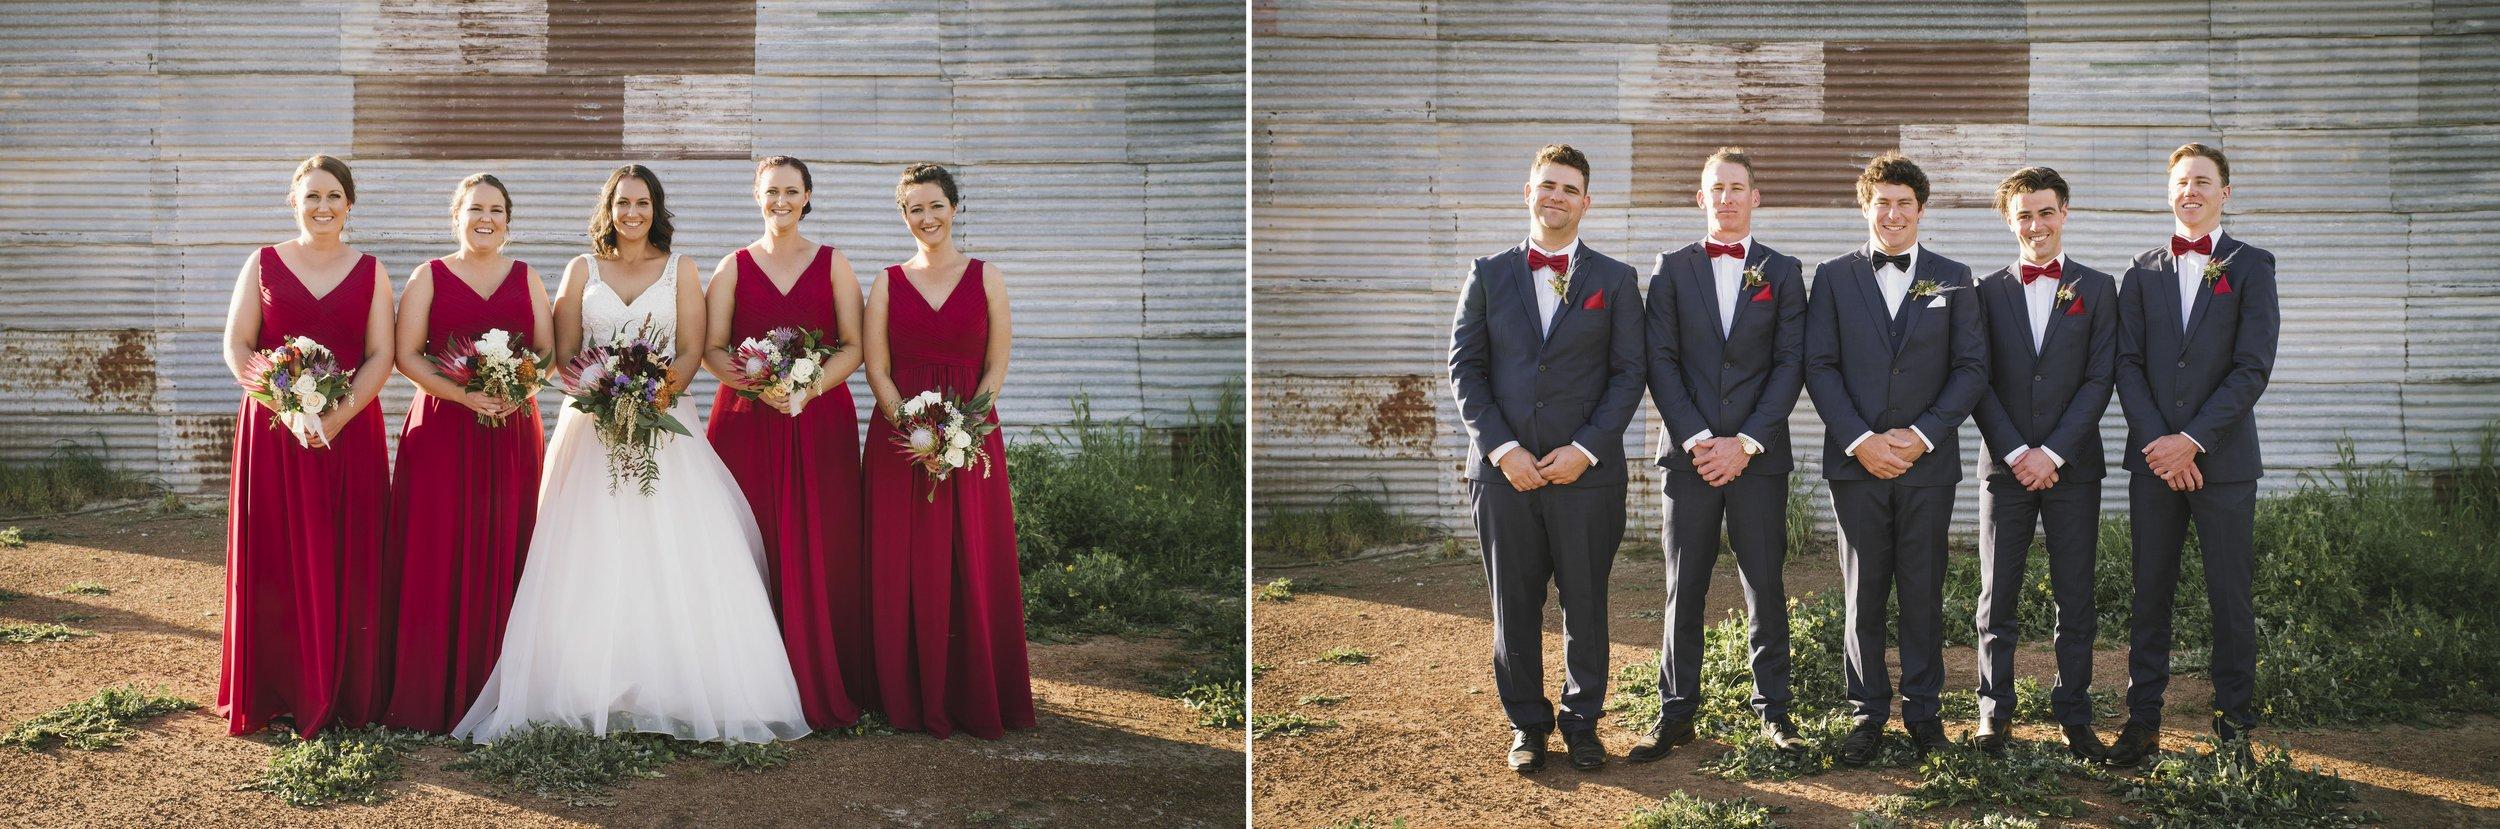 Angie Roe Photography Wheatbelt Avon Valley Farm Wedding (42and43).jpg